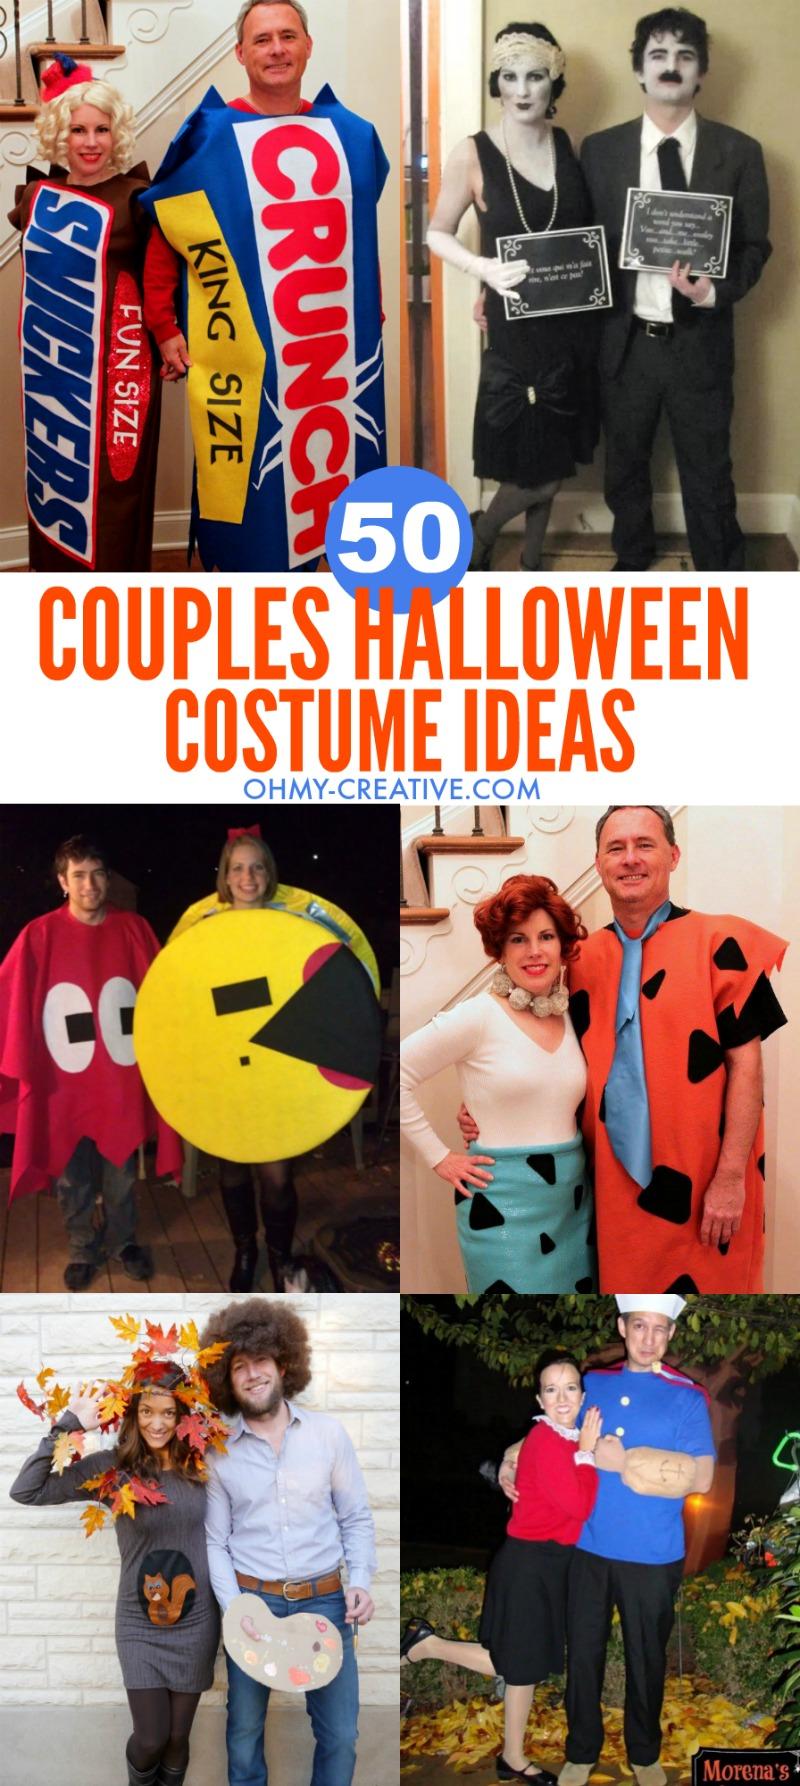 Costume Halloween Duo.50 Couples Halloween Costume Ideas Oh My Creative